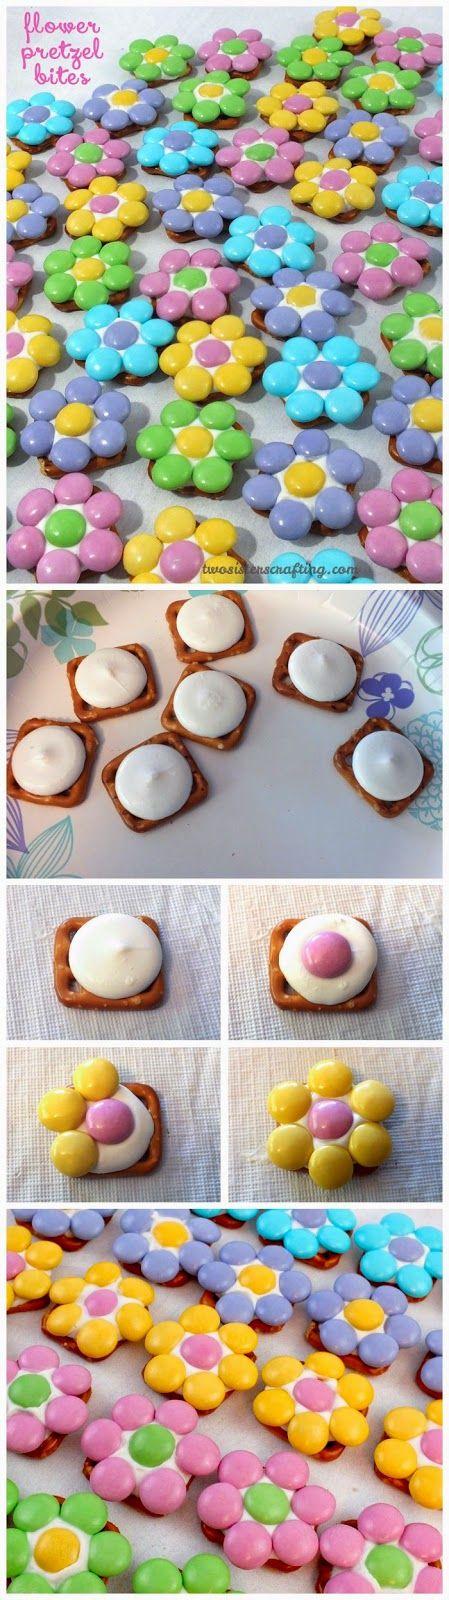 FLOWER PRETZEL BITES    Ingredients:   Pretzel Snaps  Wilton Bright White Candy Melts  Easter Milk Chocolate M&M's    See full instructio...